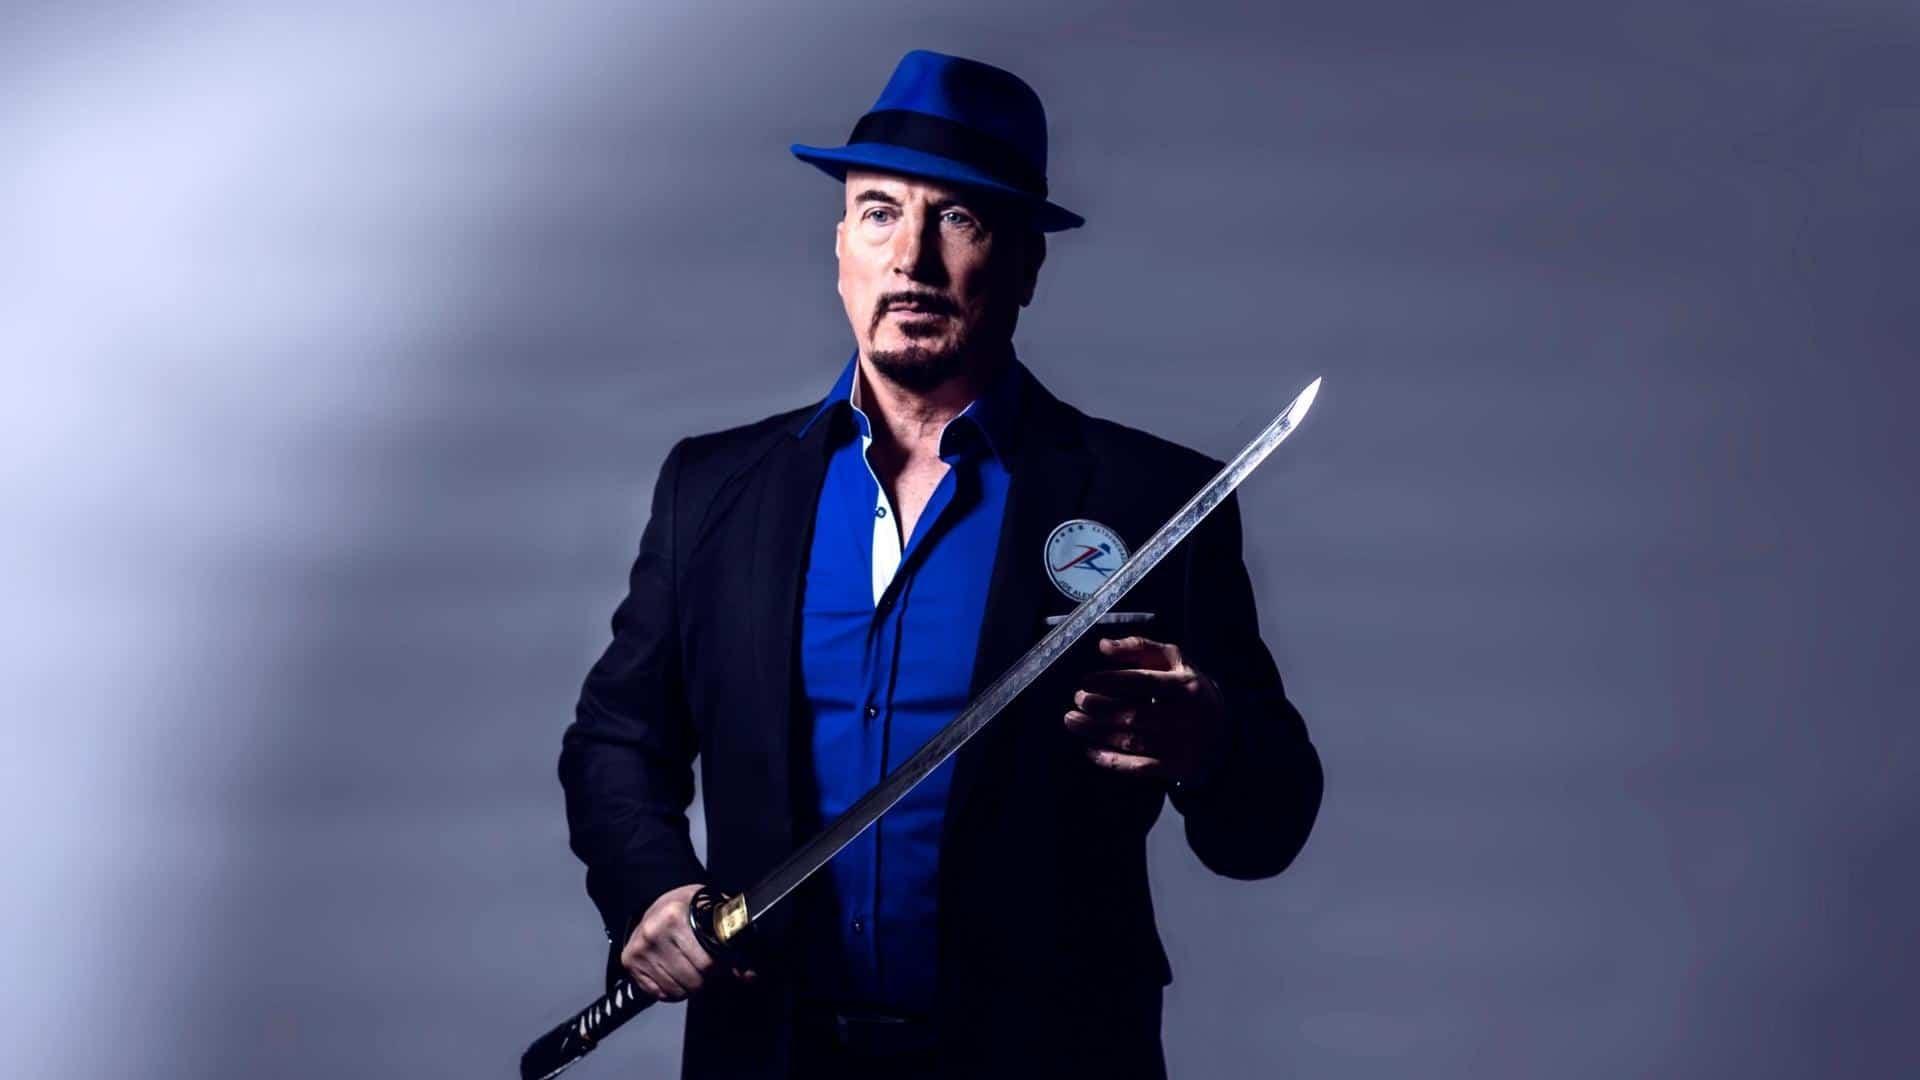 joe-alexander-coaching-business-samurai